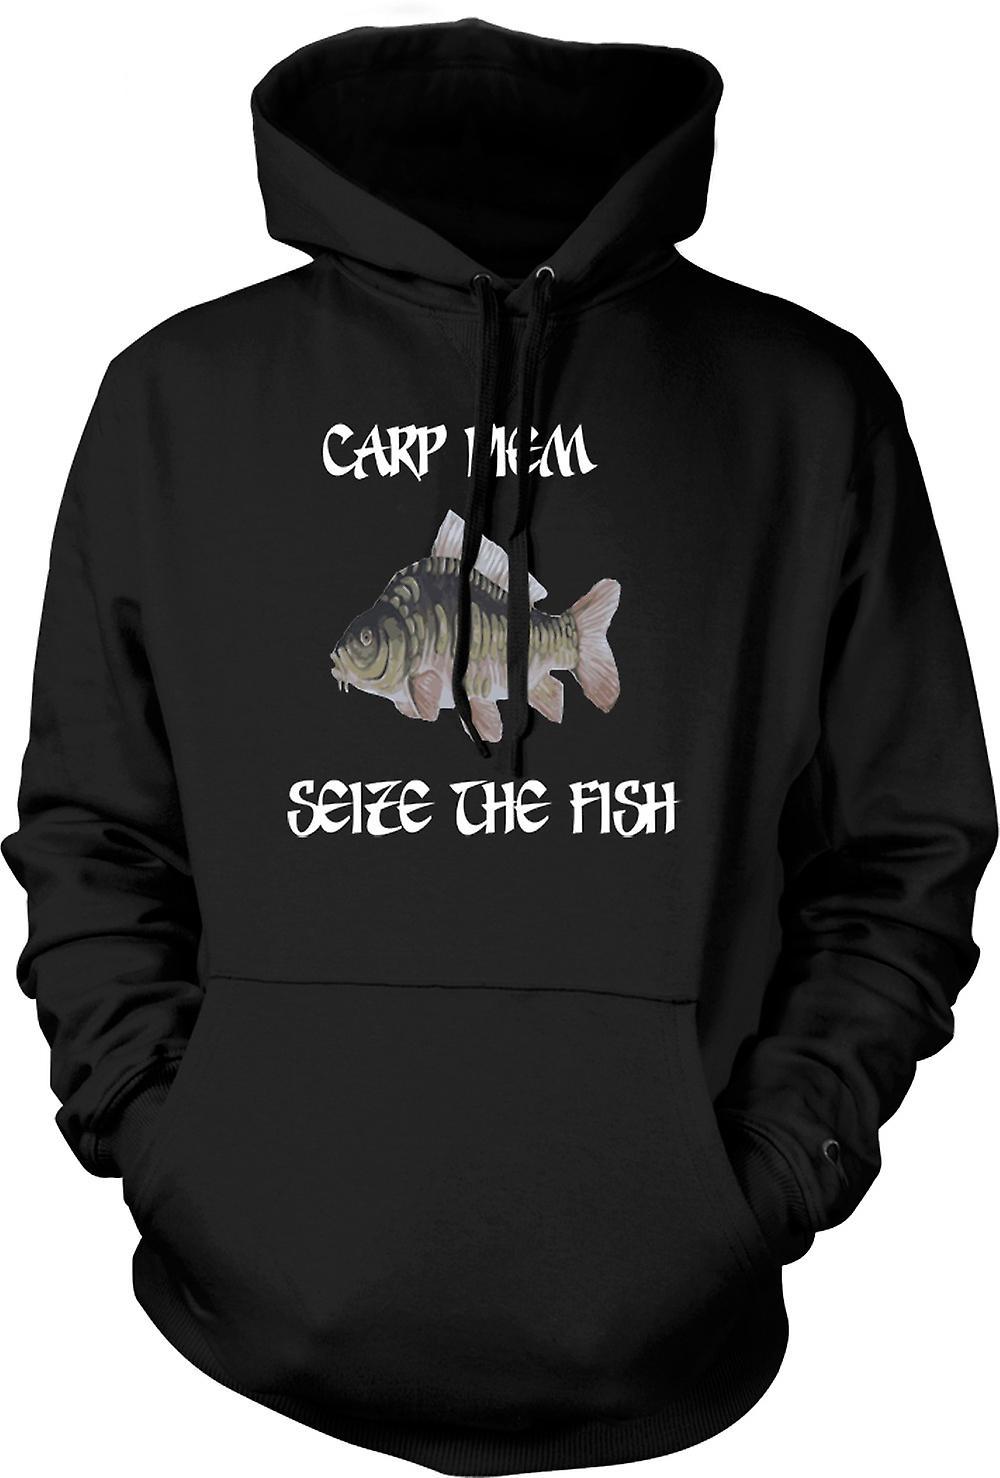 Mens Hoodie - Carp Diem - Seize The Fish - Funny